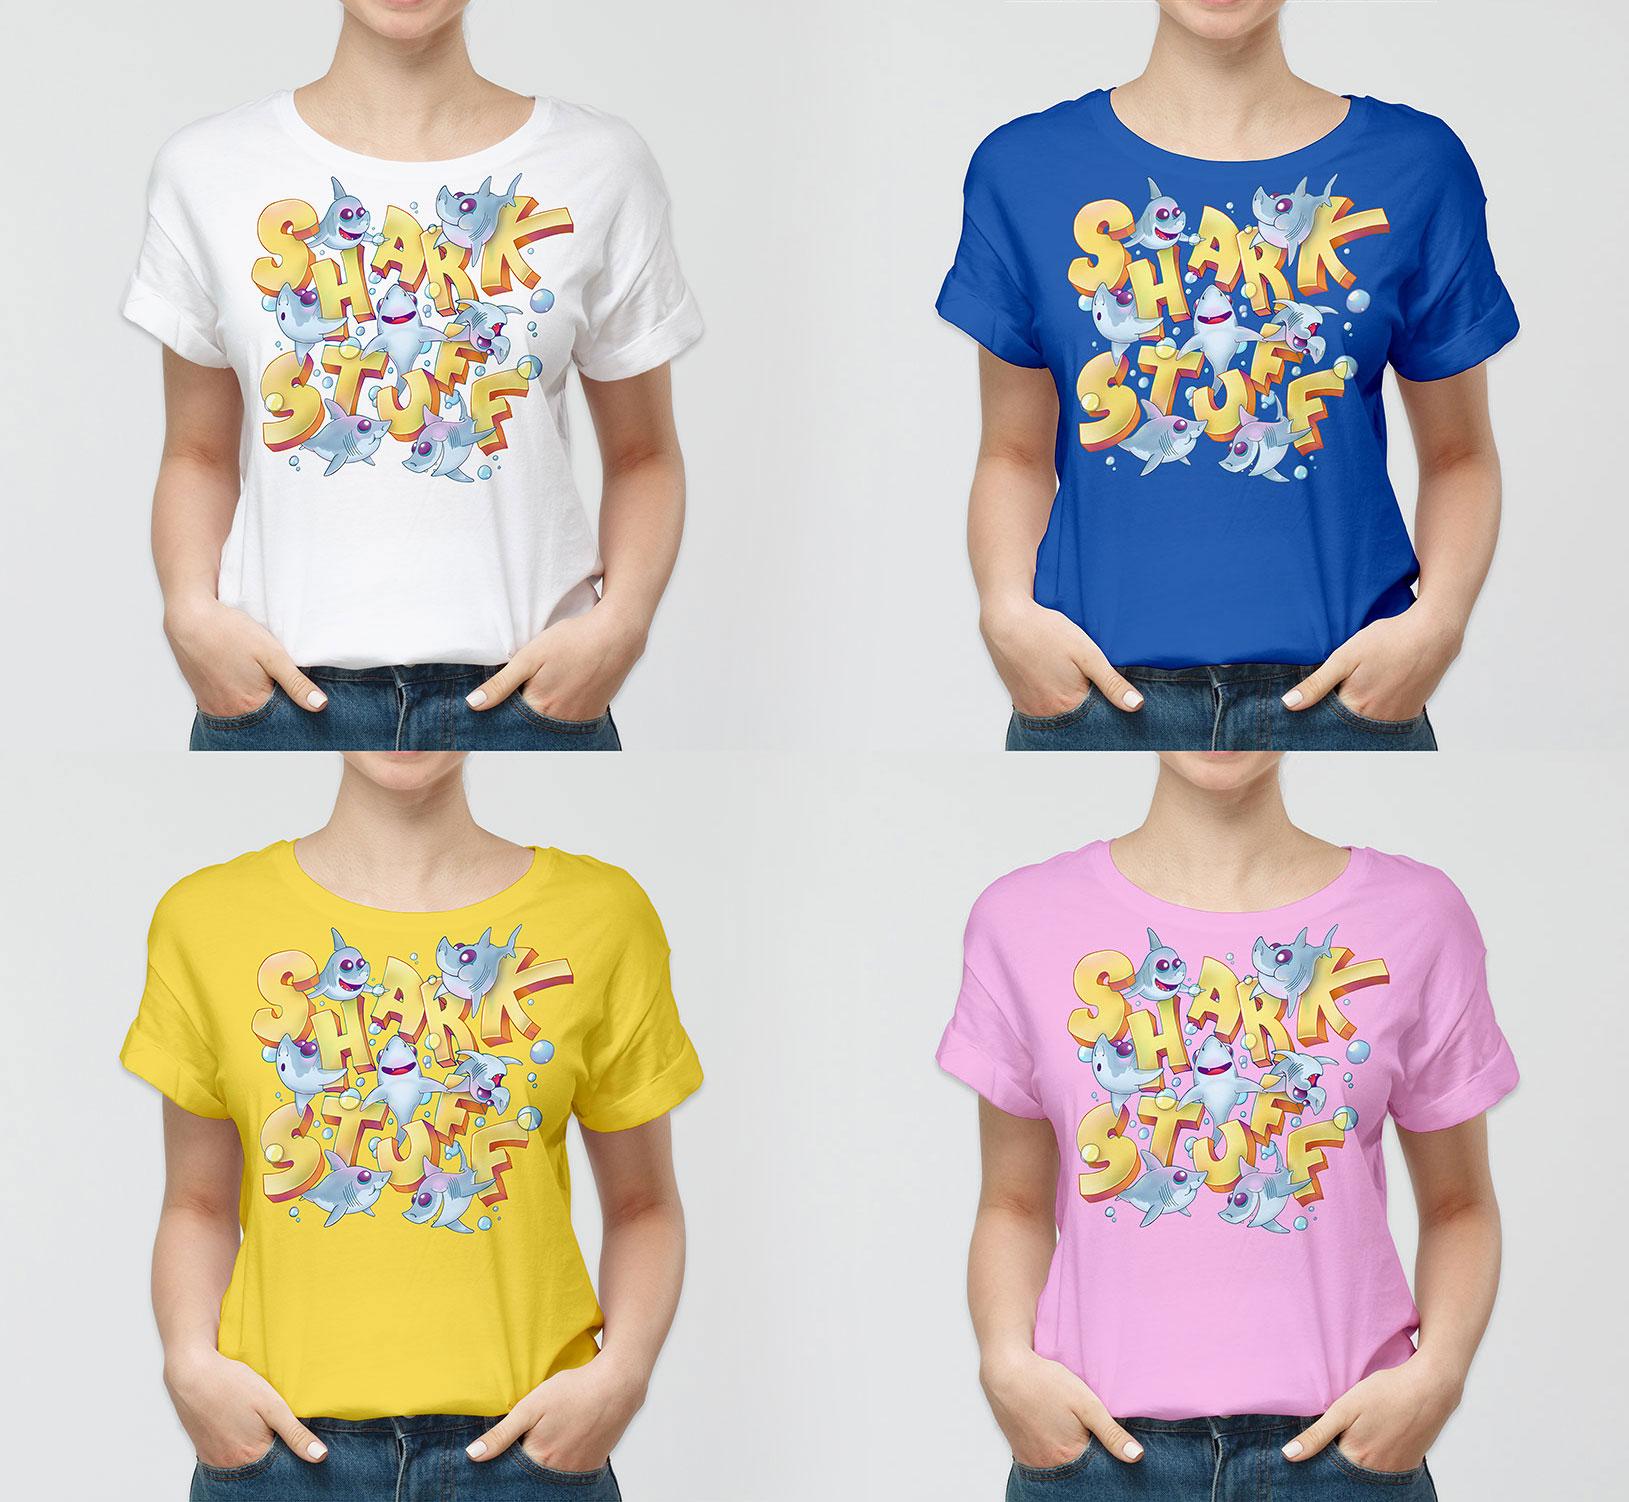 © SharkStuff – Scaled T-shirt drafts